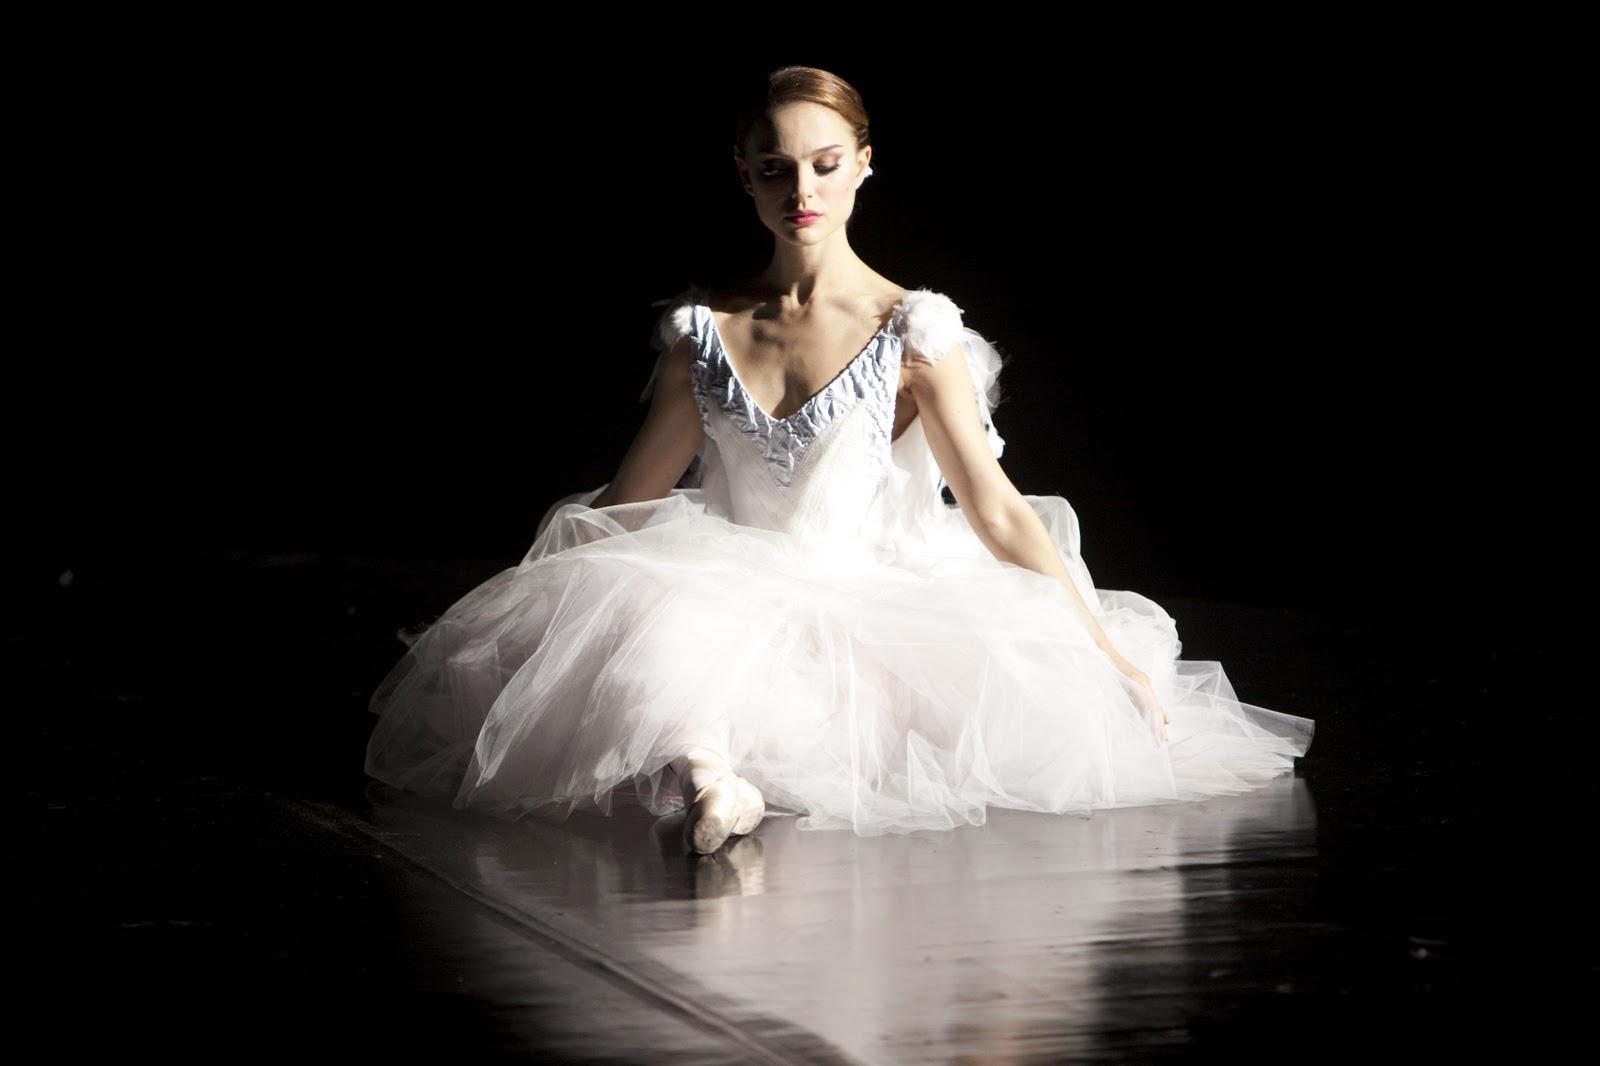 http://1.bp.blogspot.com/-blWW3D1z2J0/TrY9--sFTBI/AAAAAAAAkUU/ZaEV4LJOzpY/s1600/Black-Swan-Wallpaper-Photo-Natalie-Portman-as-Nina-Sayers-2.jpg